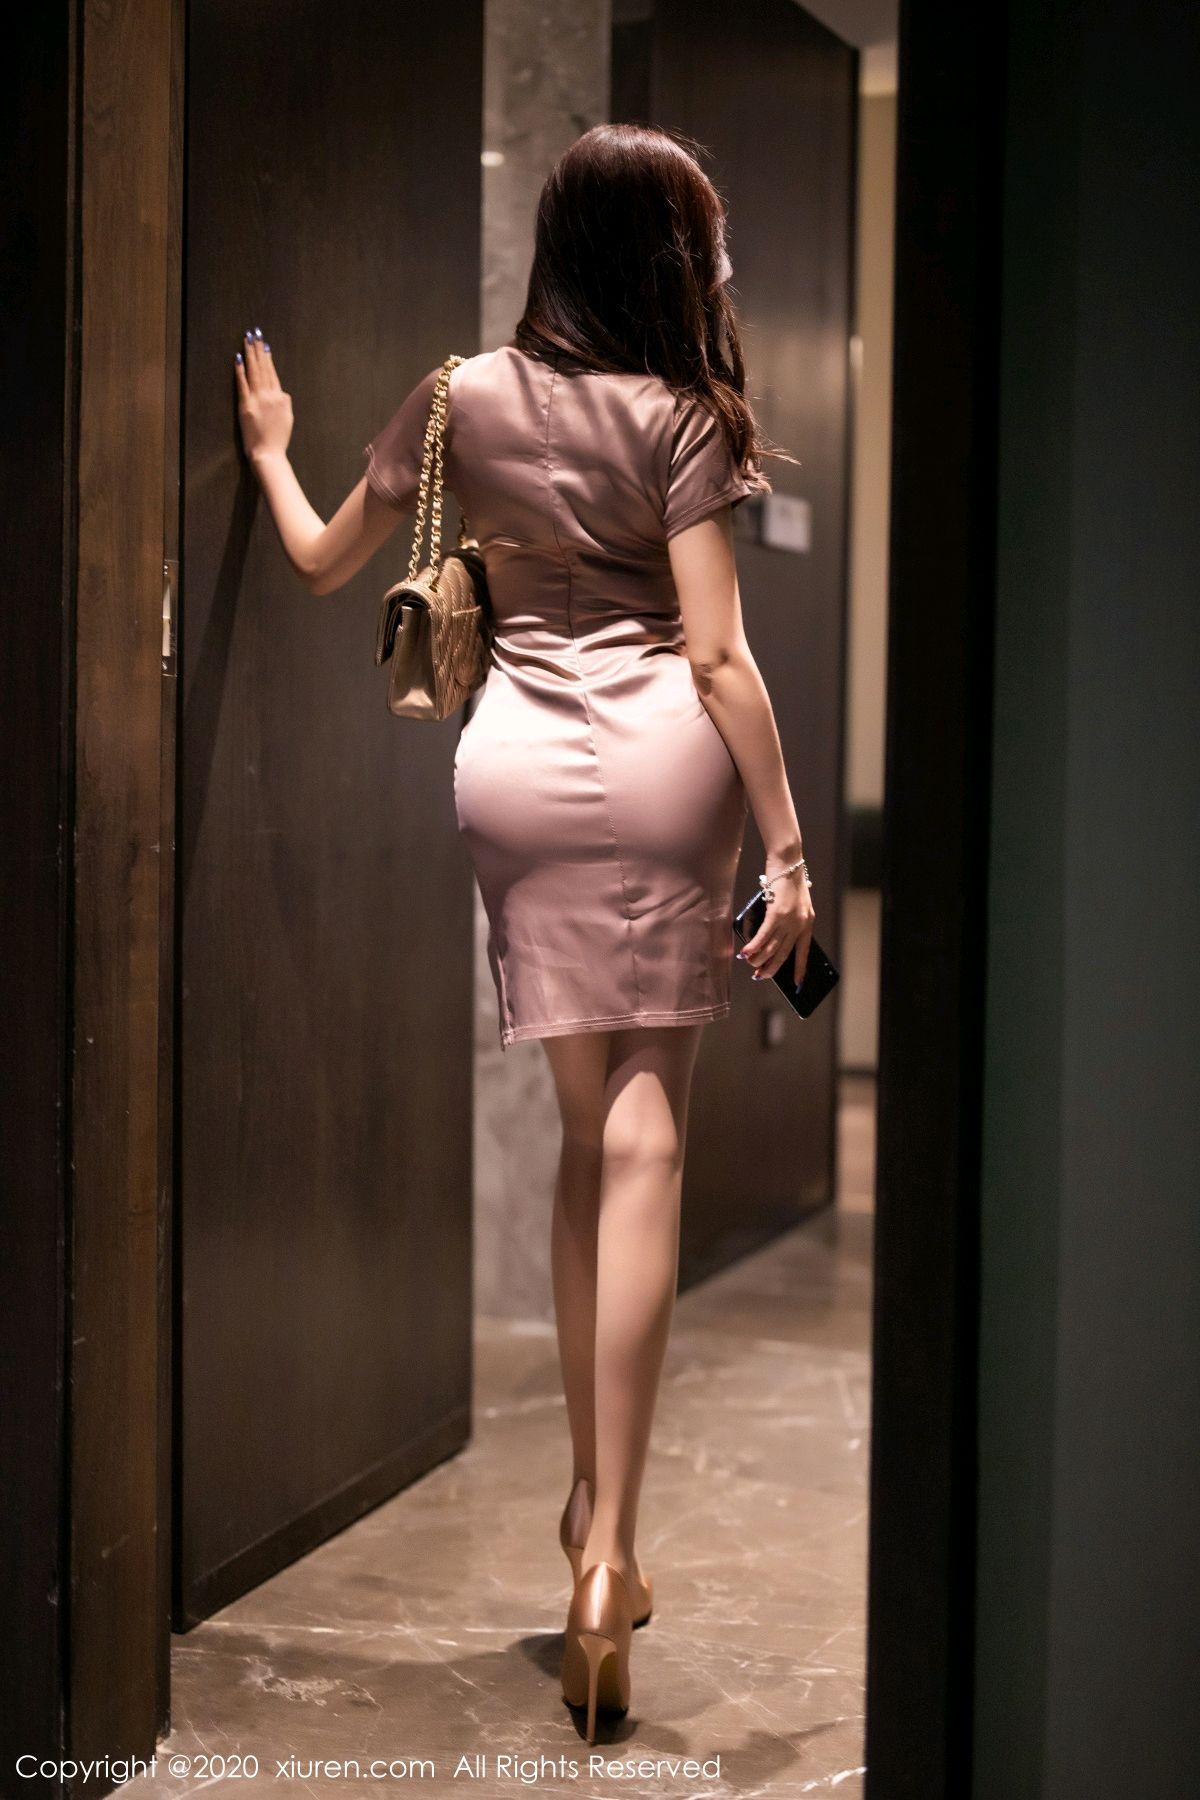 [XiuRen] Vol.2587 Yang Chen Chen 29P, Underwear, Xiuren, Yang Chen Chen